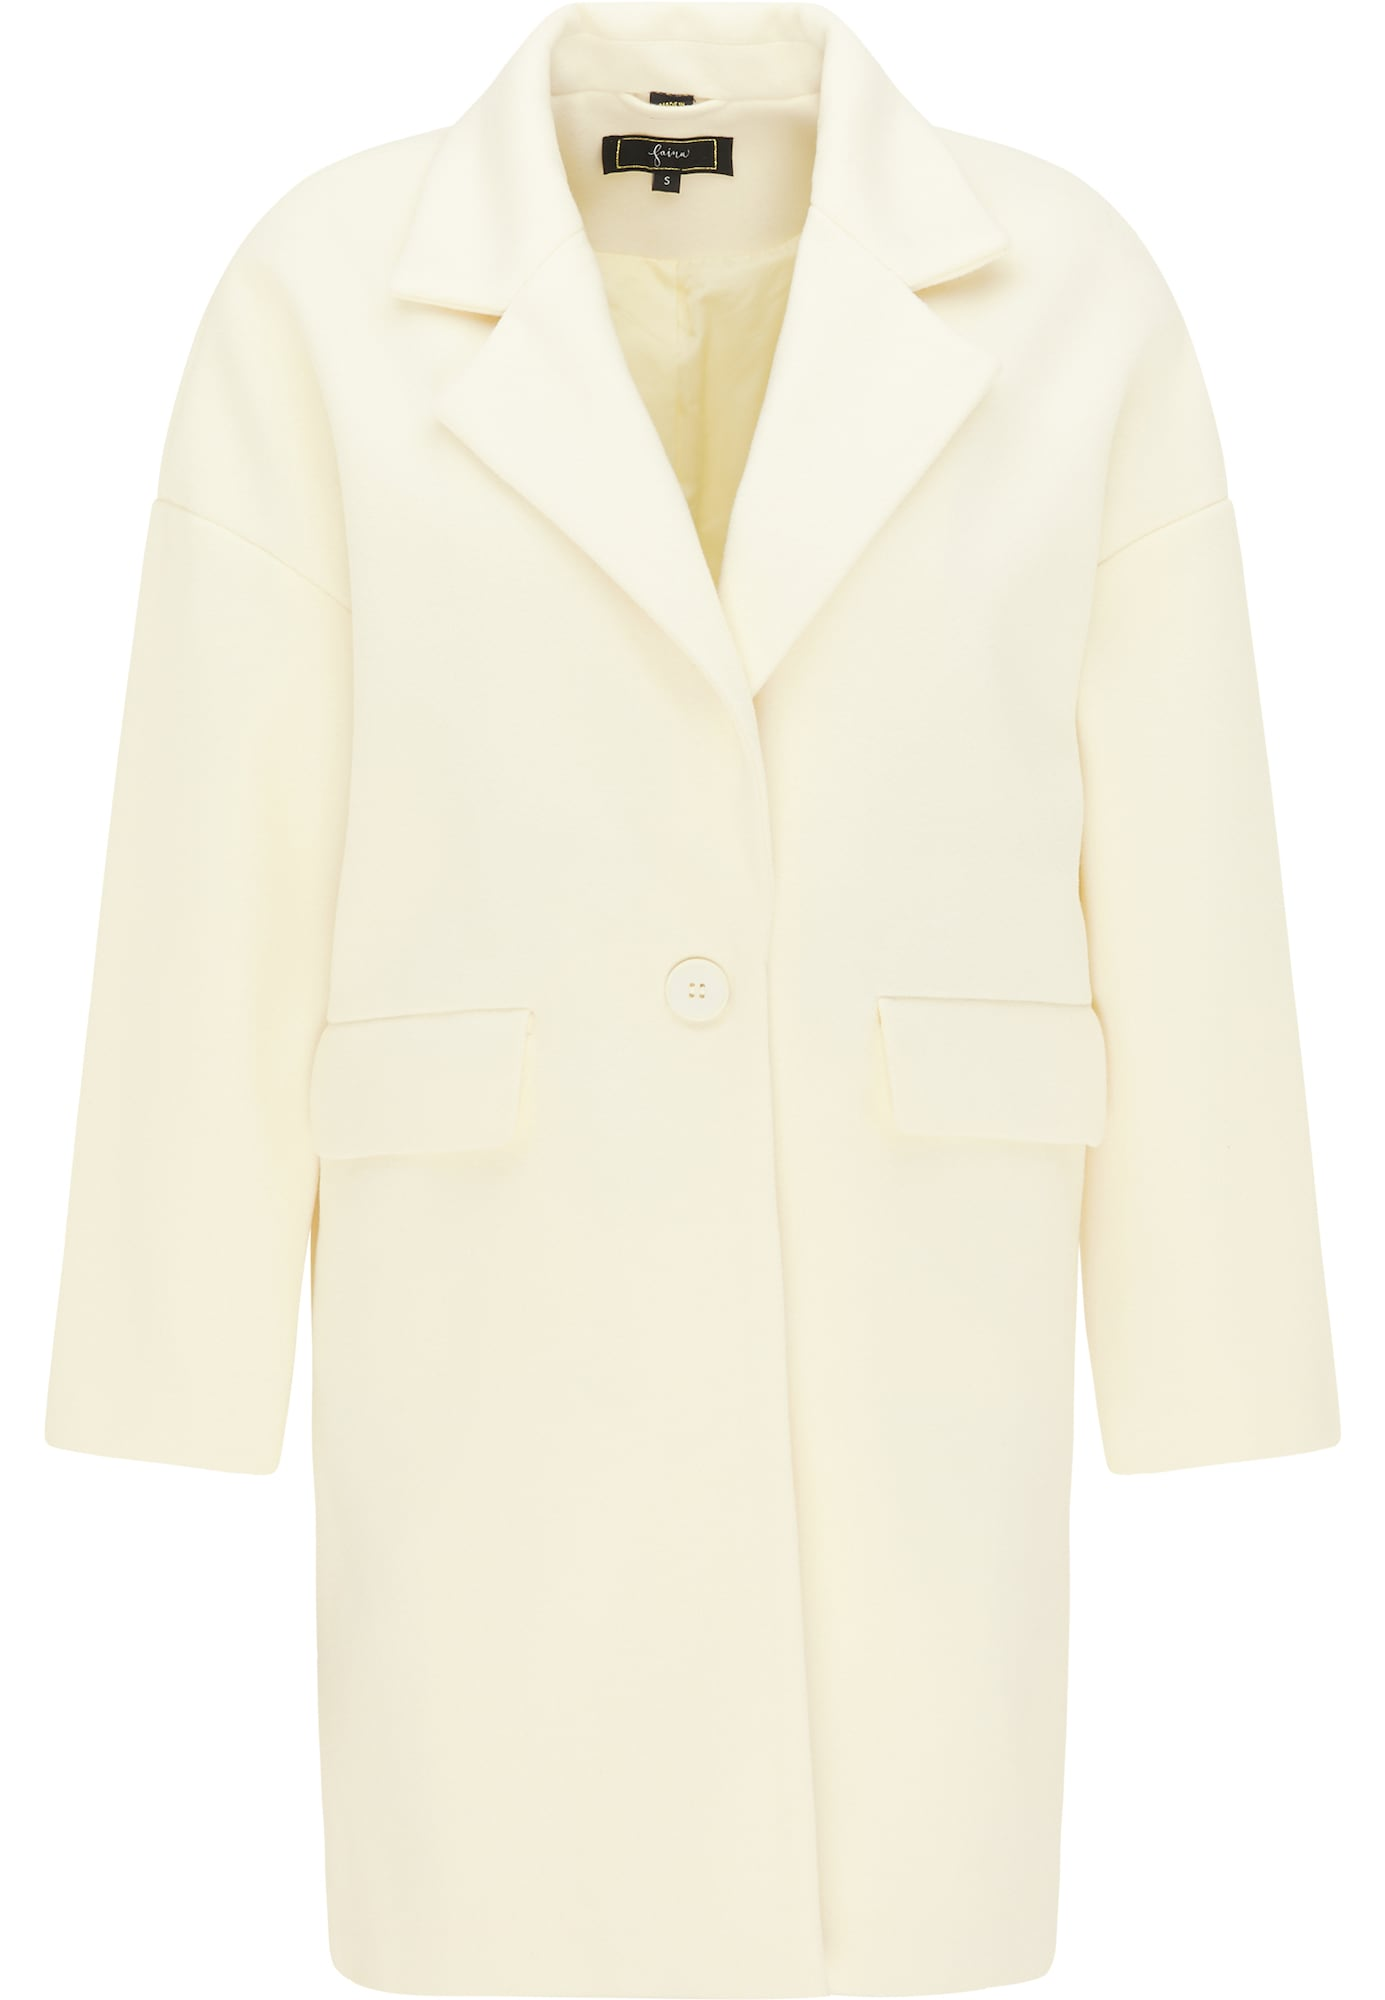 faina Demisezoninis paltas natūrali balta